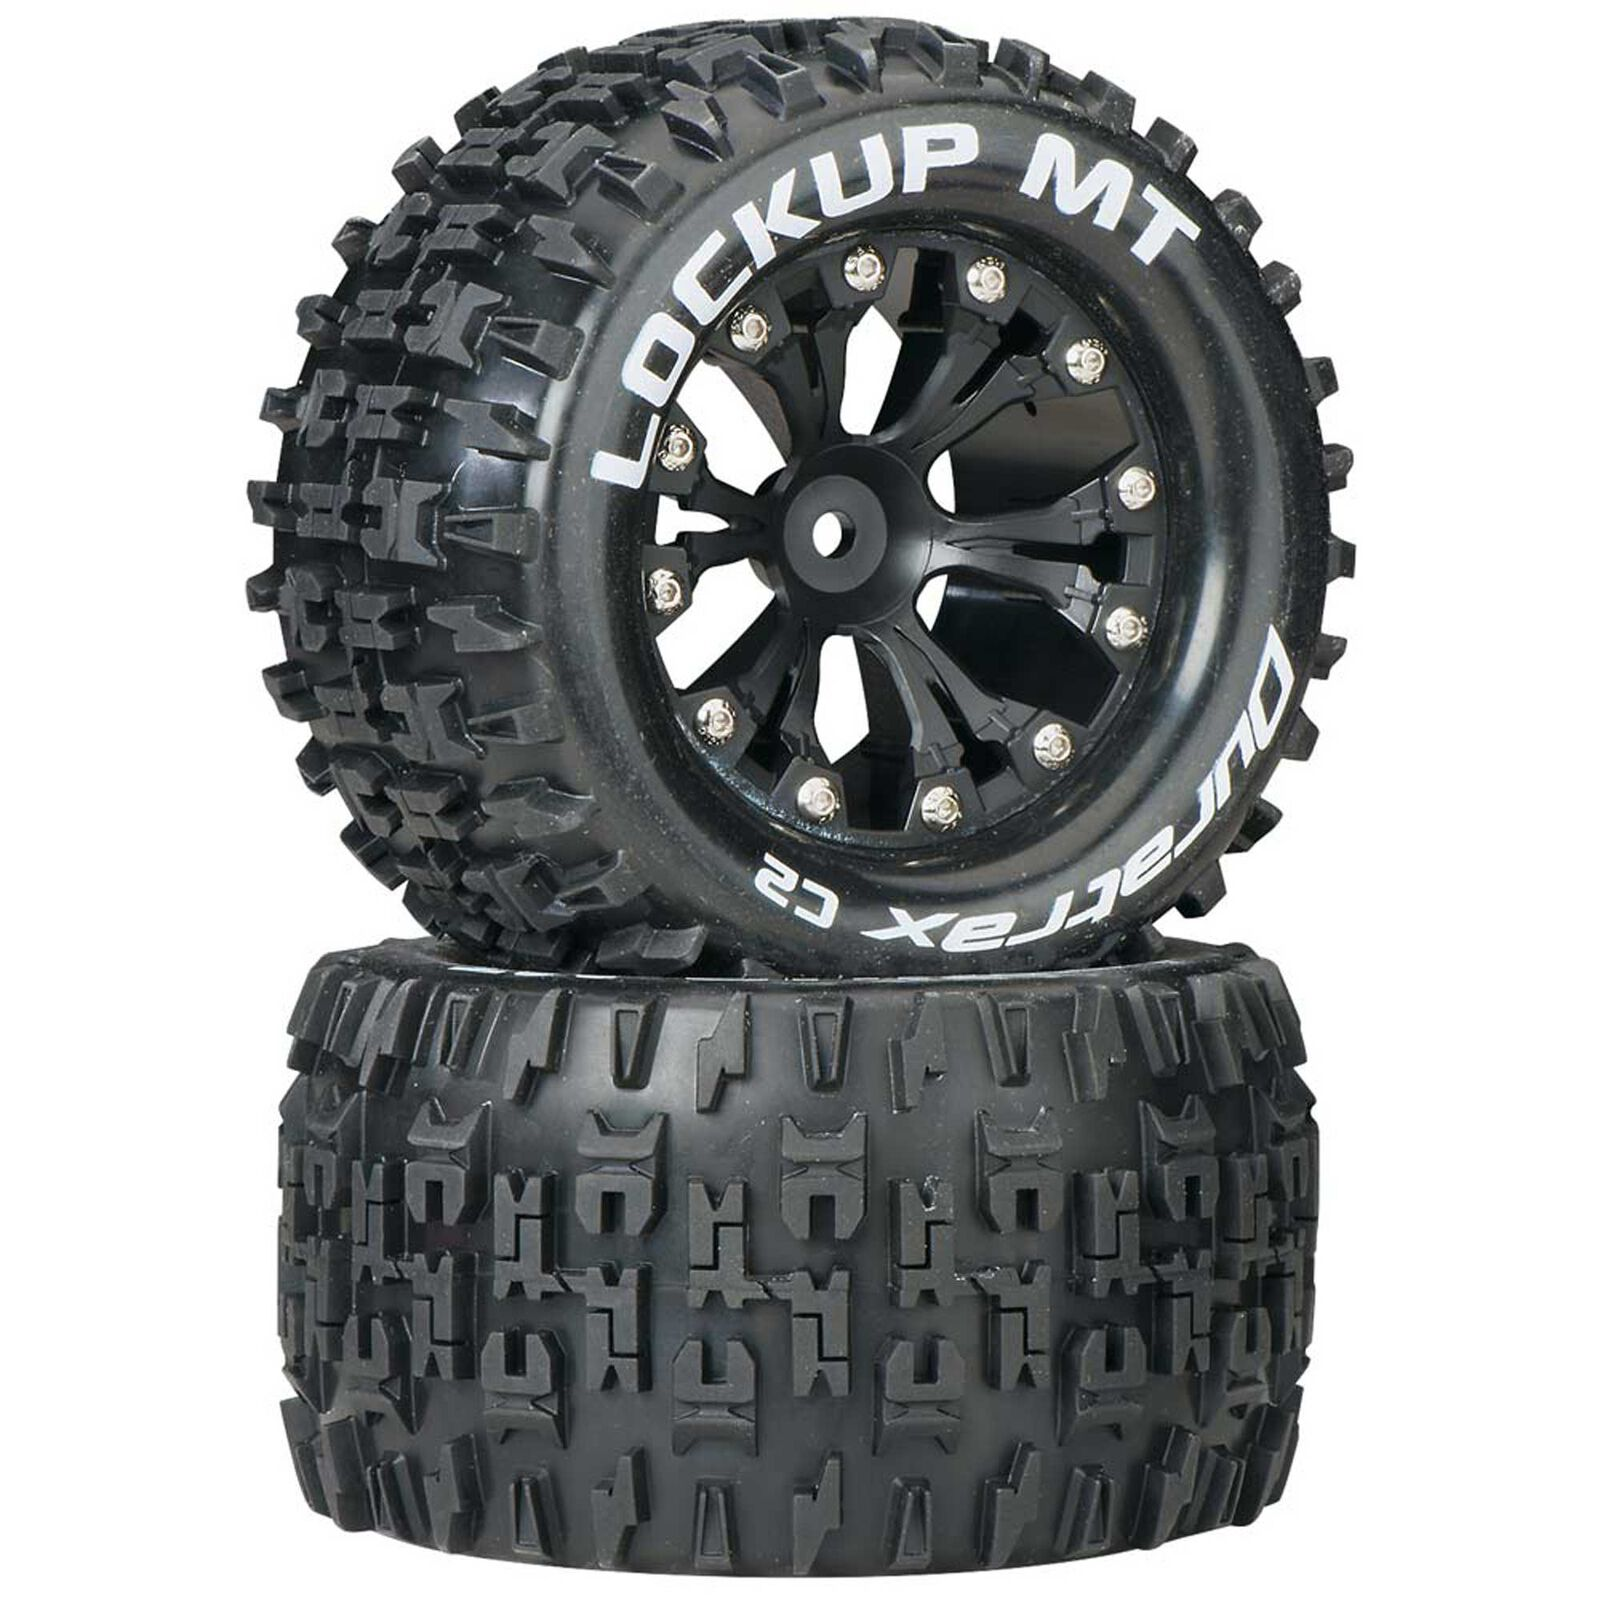 "Lockup MT 2.8"" 2WD Mounted Rear C2 Tires, Black (2)"